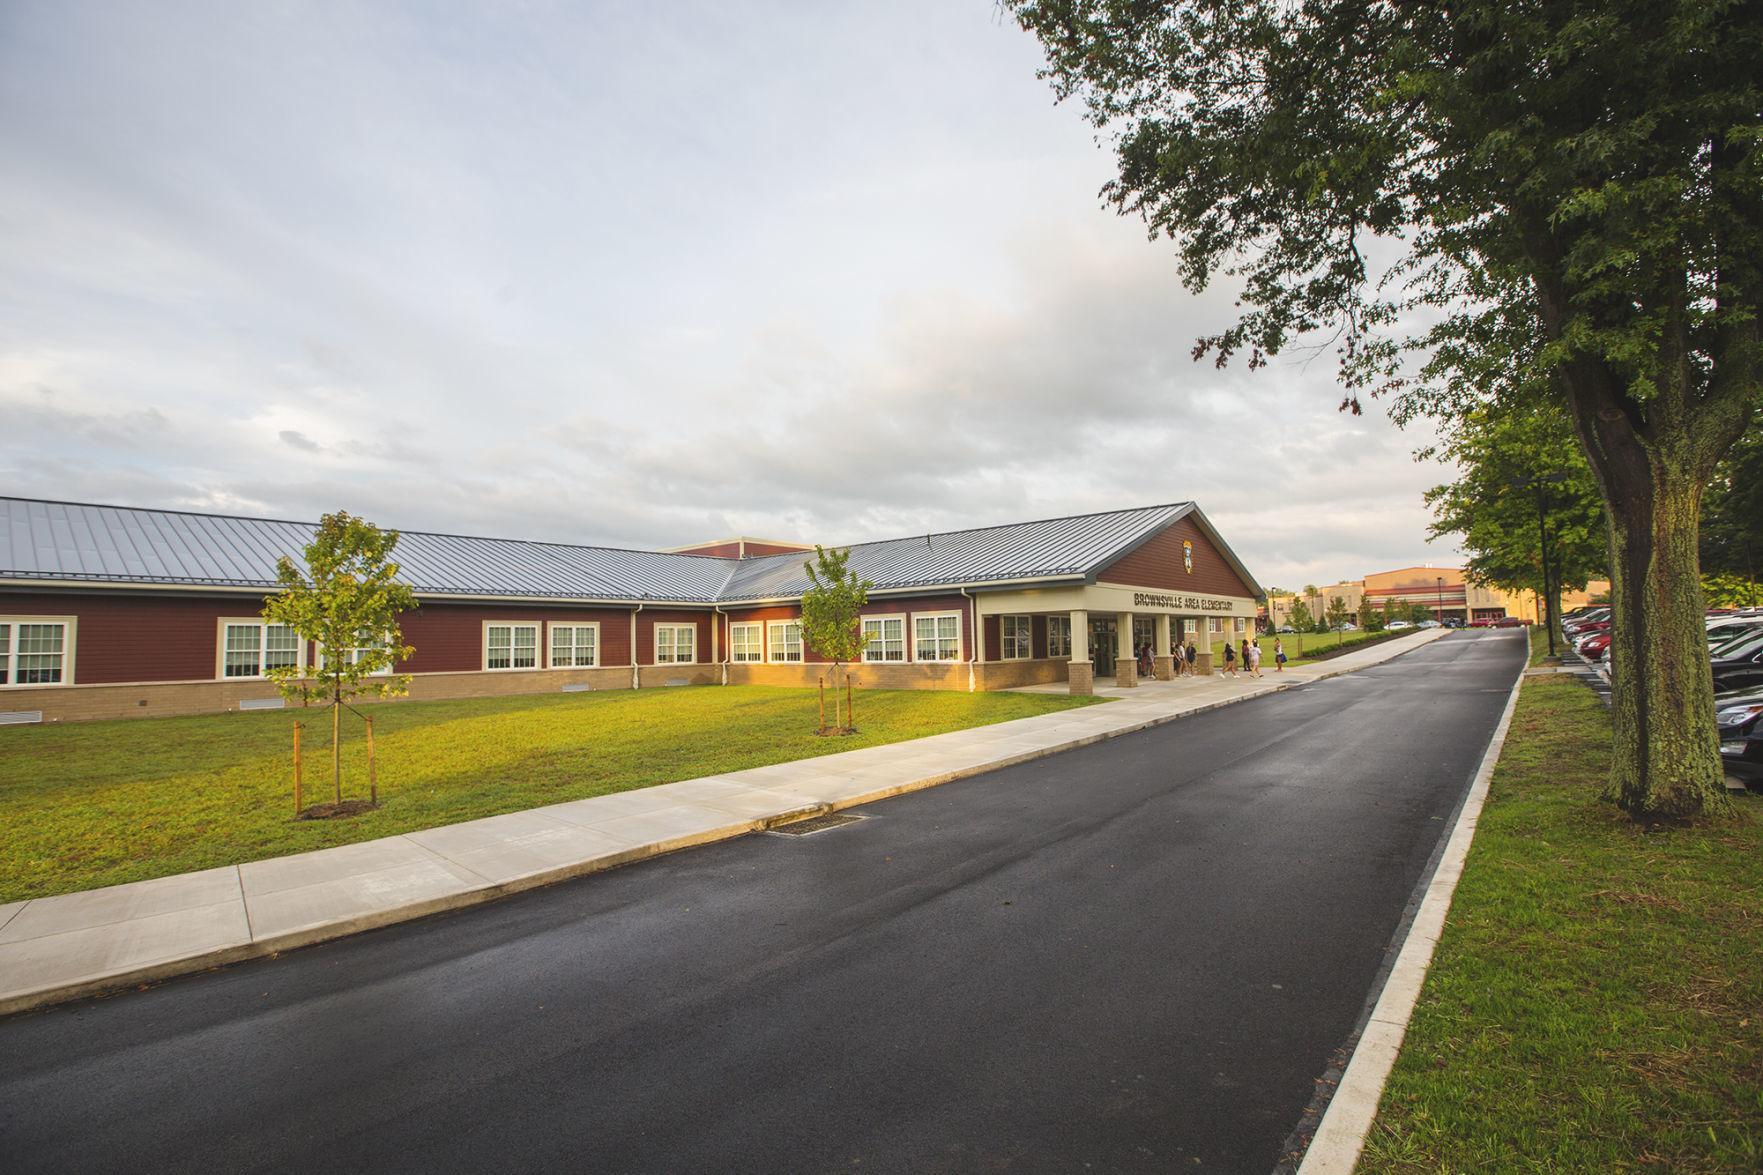 Brownsville Area Elementary School